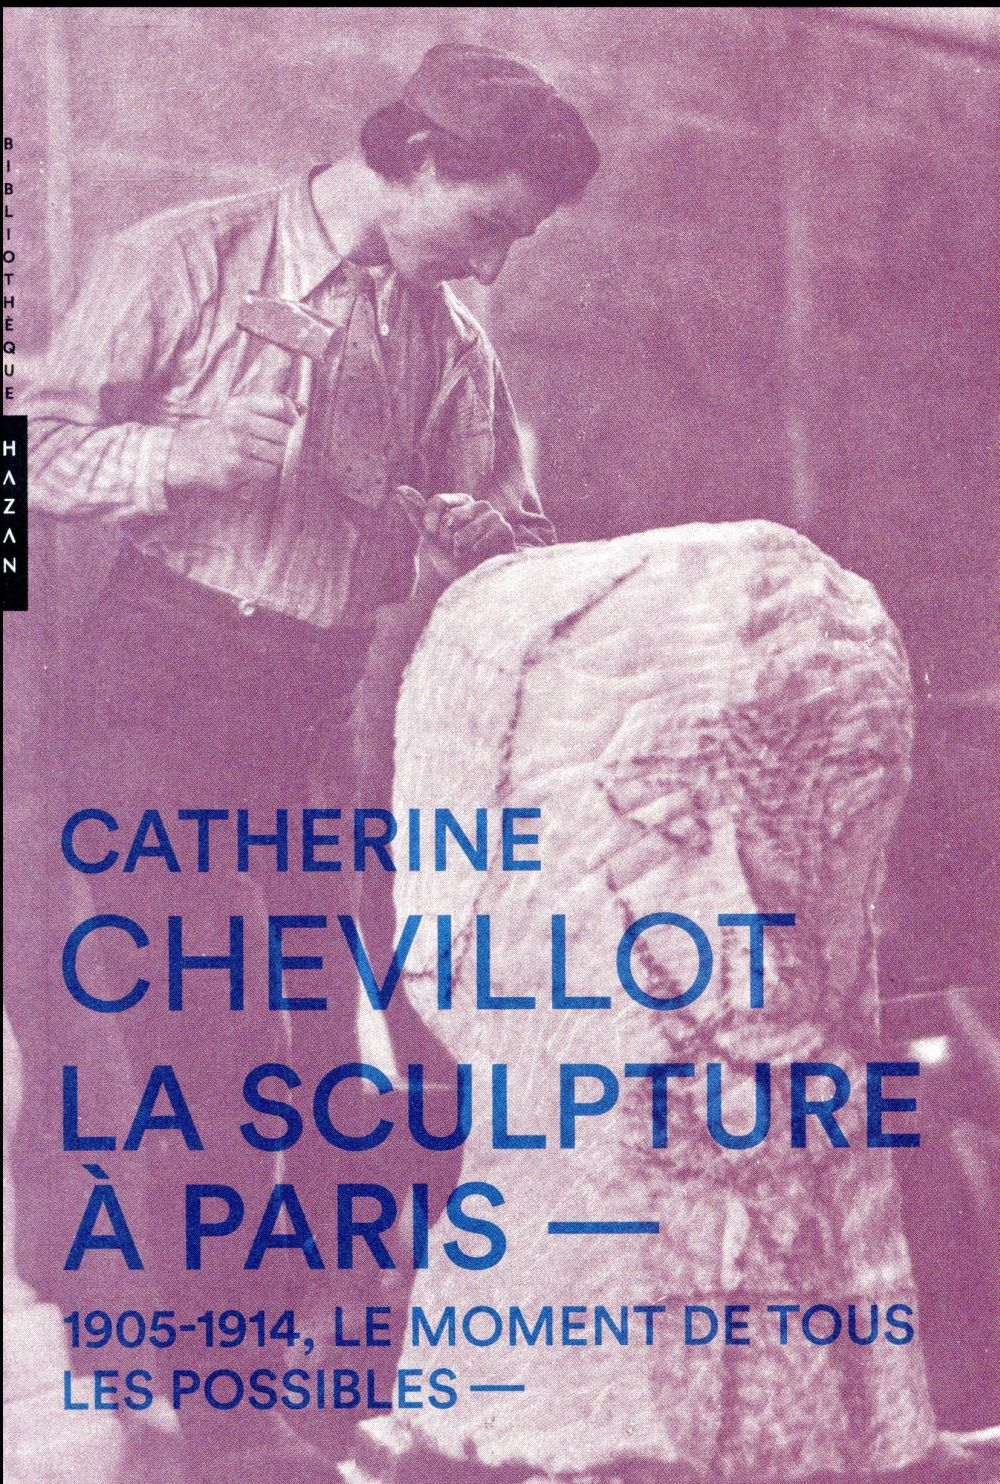 LA SCULPTURE A PARIS. 1905-191